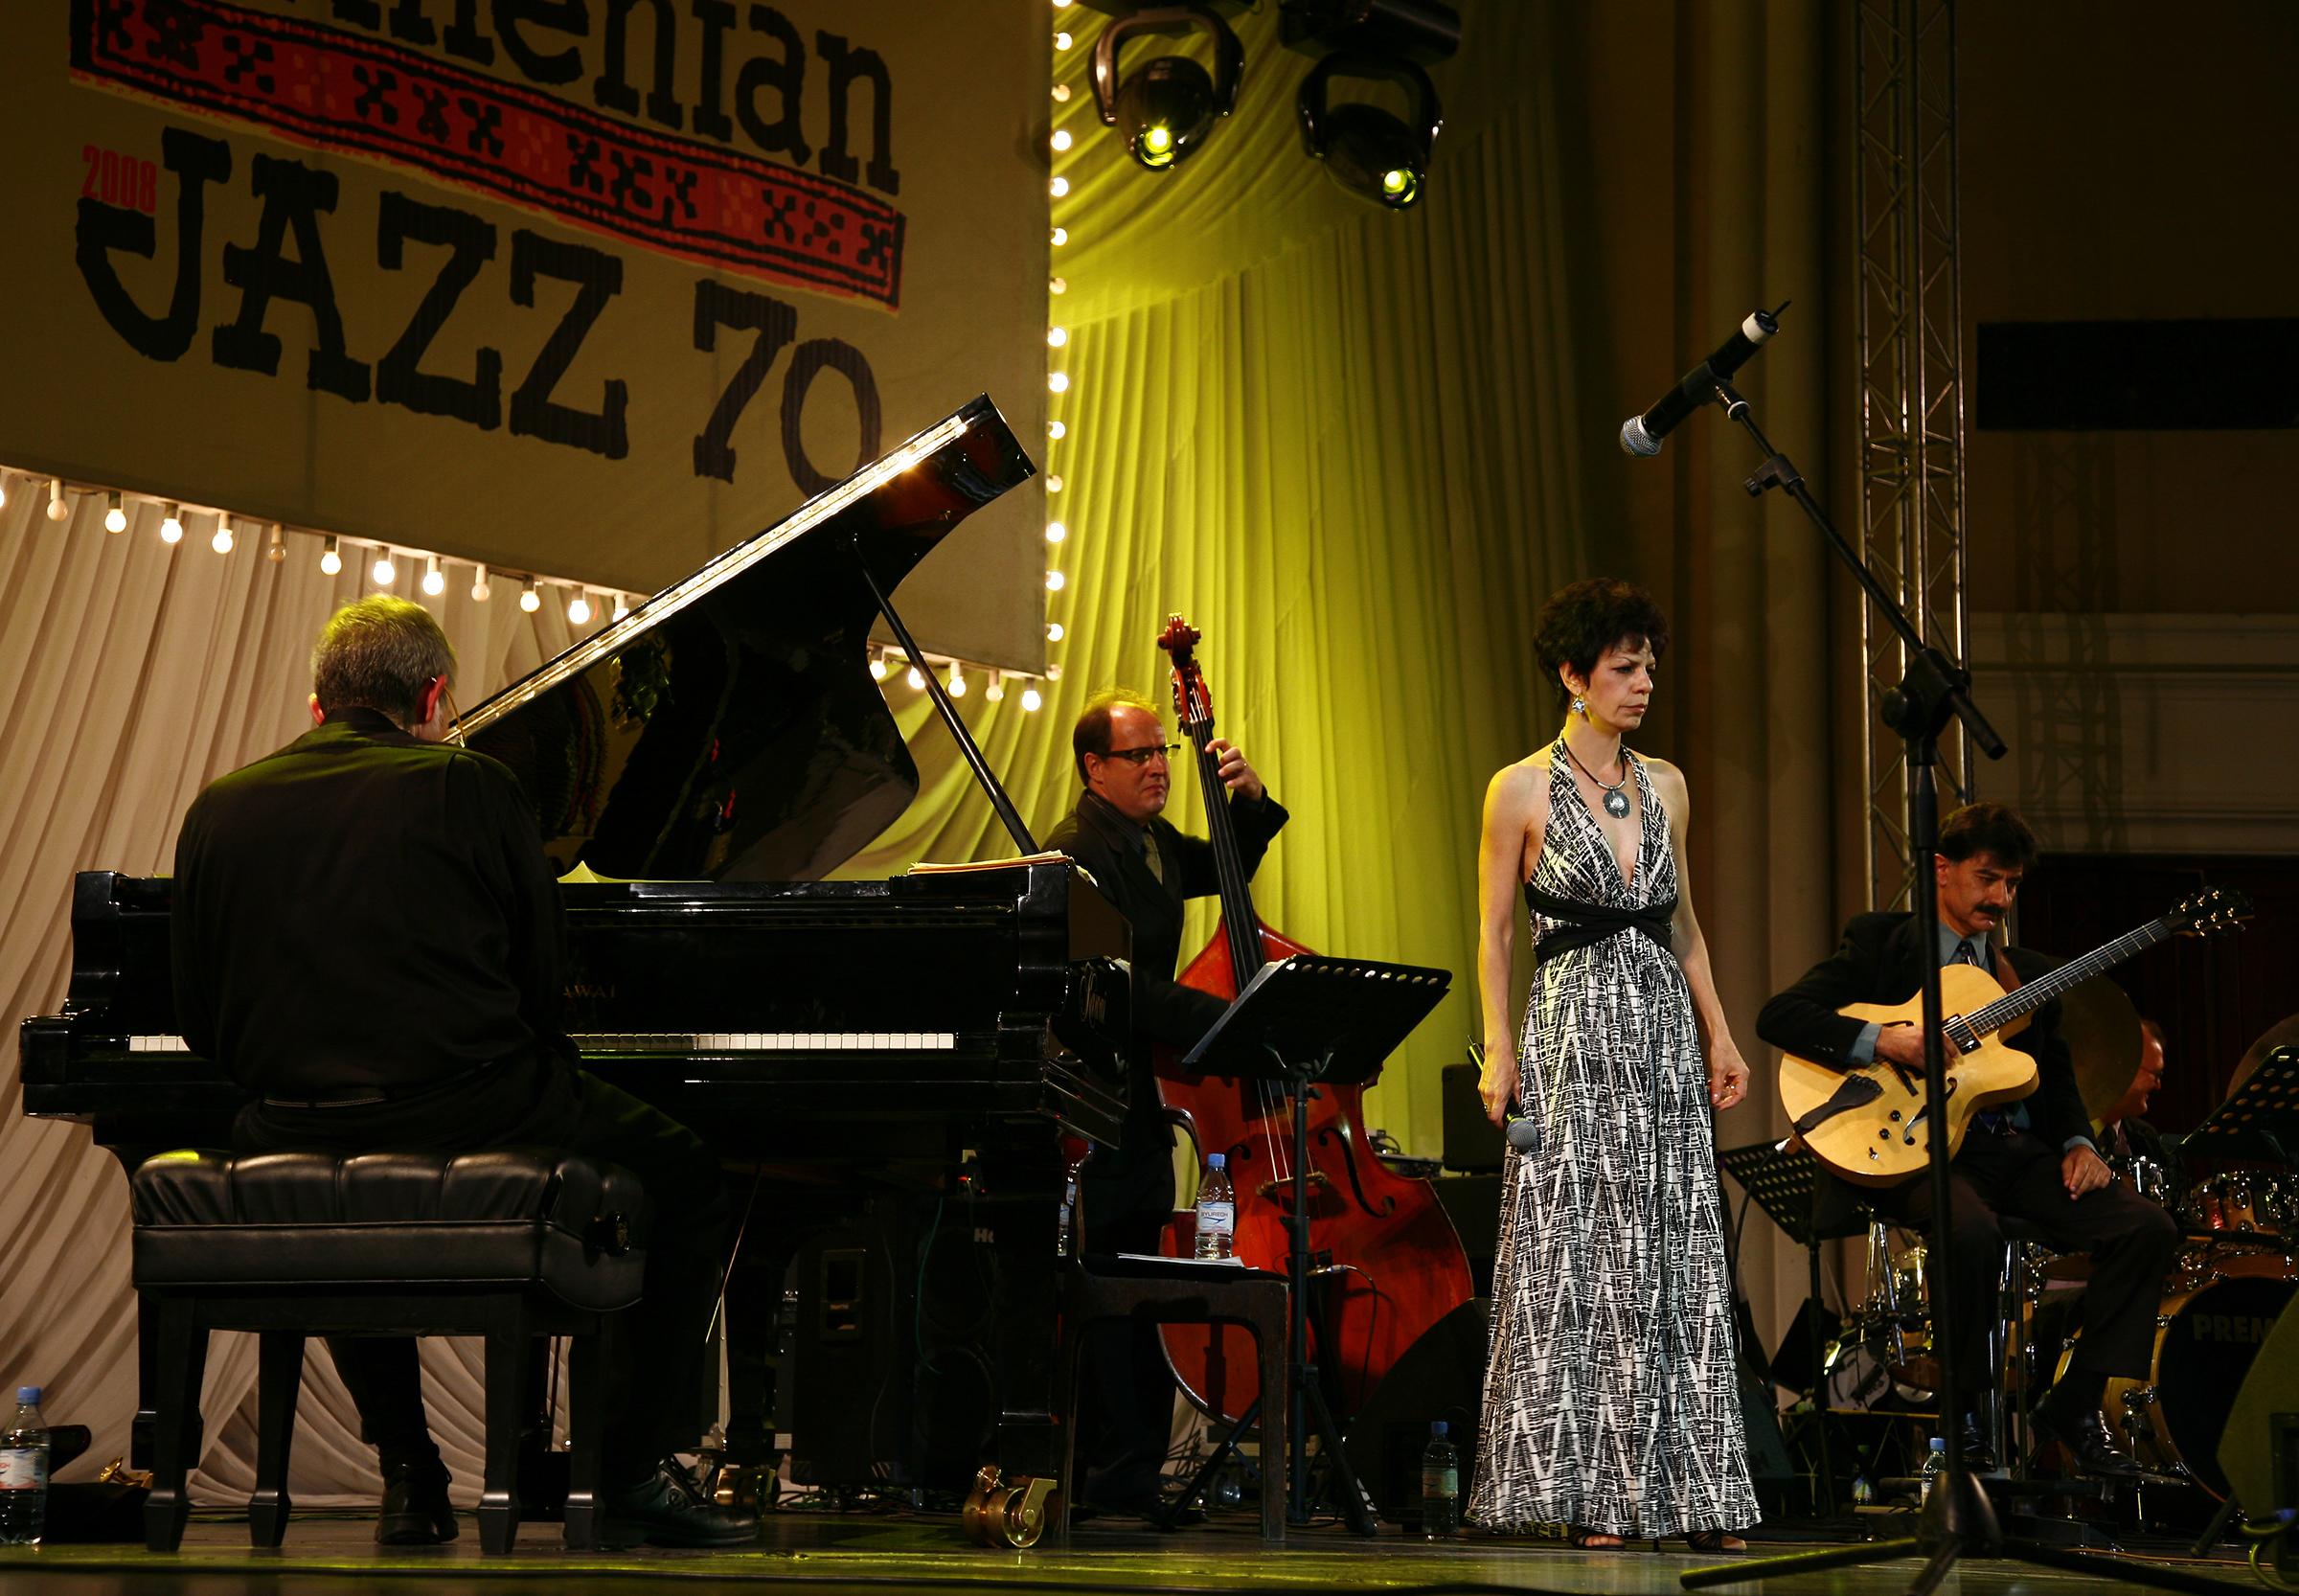 Armenia Jazz 70 Festival-k.jpg